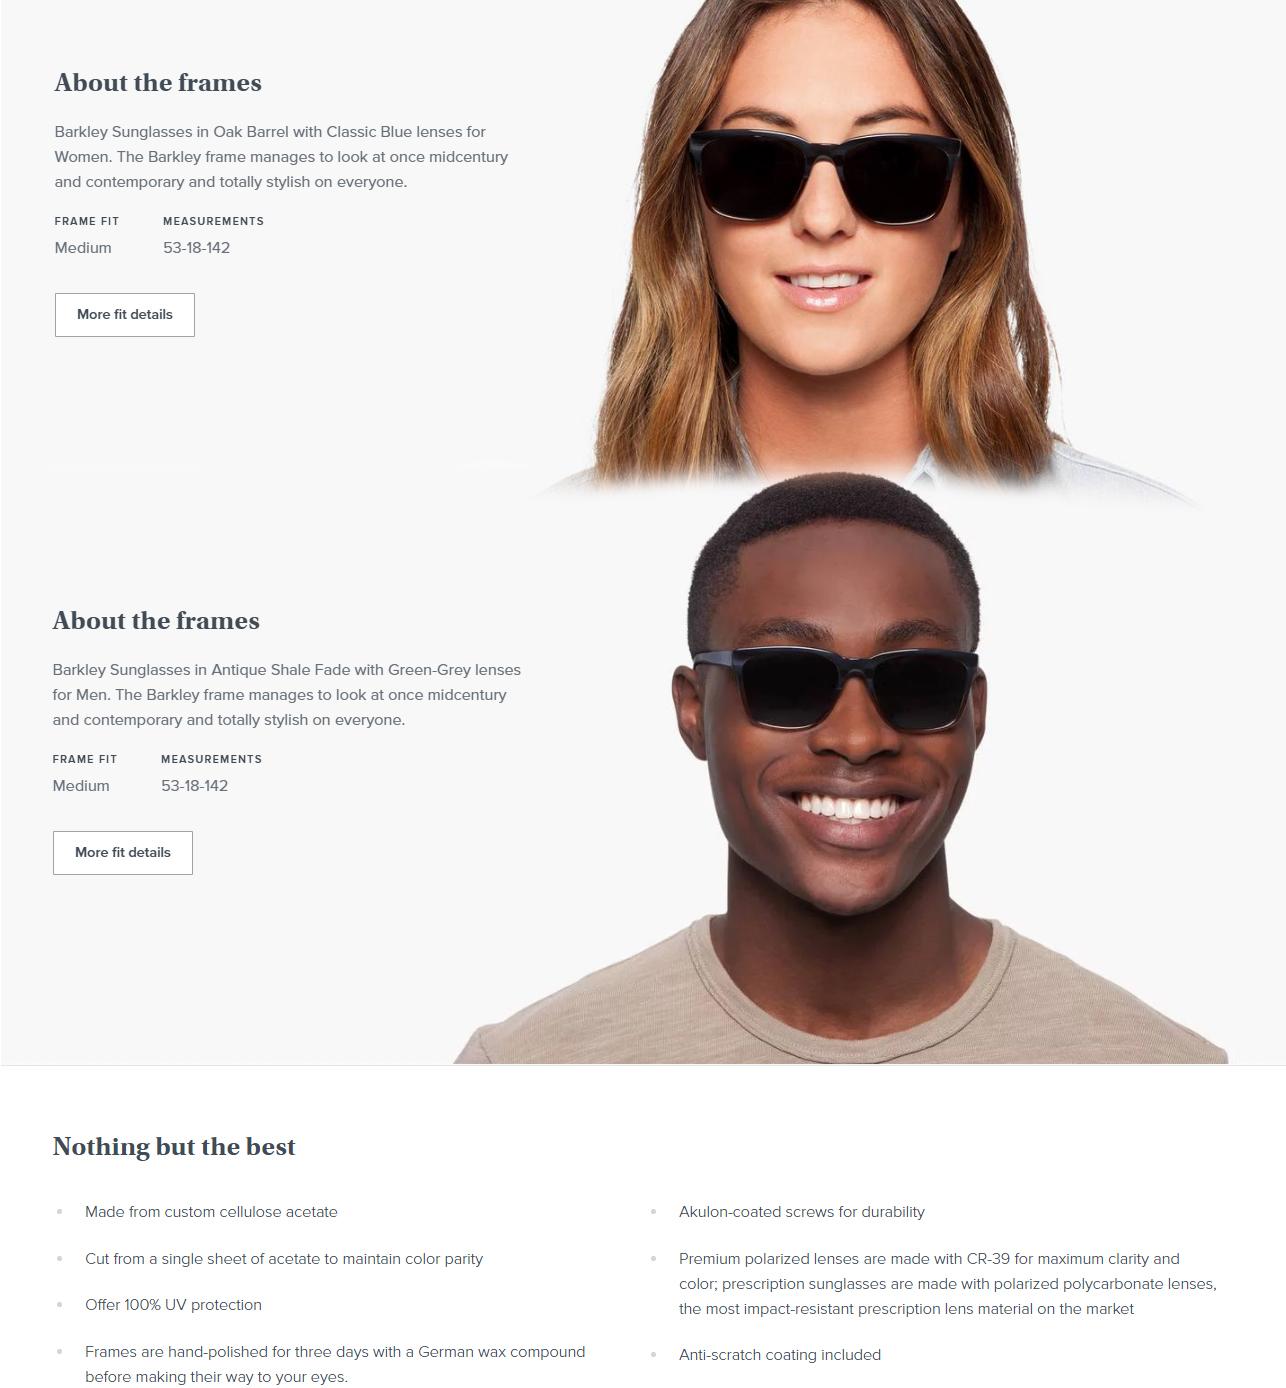 c4c0601d4e8 Nuevos Lentes De Sol Clásicos Unisex Barkley Warby Parker Moda ...